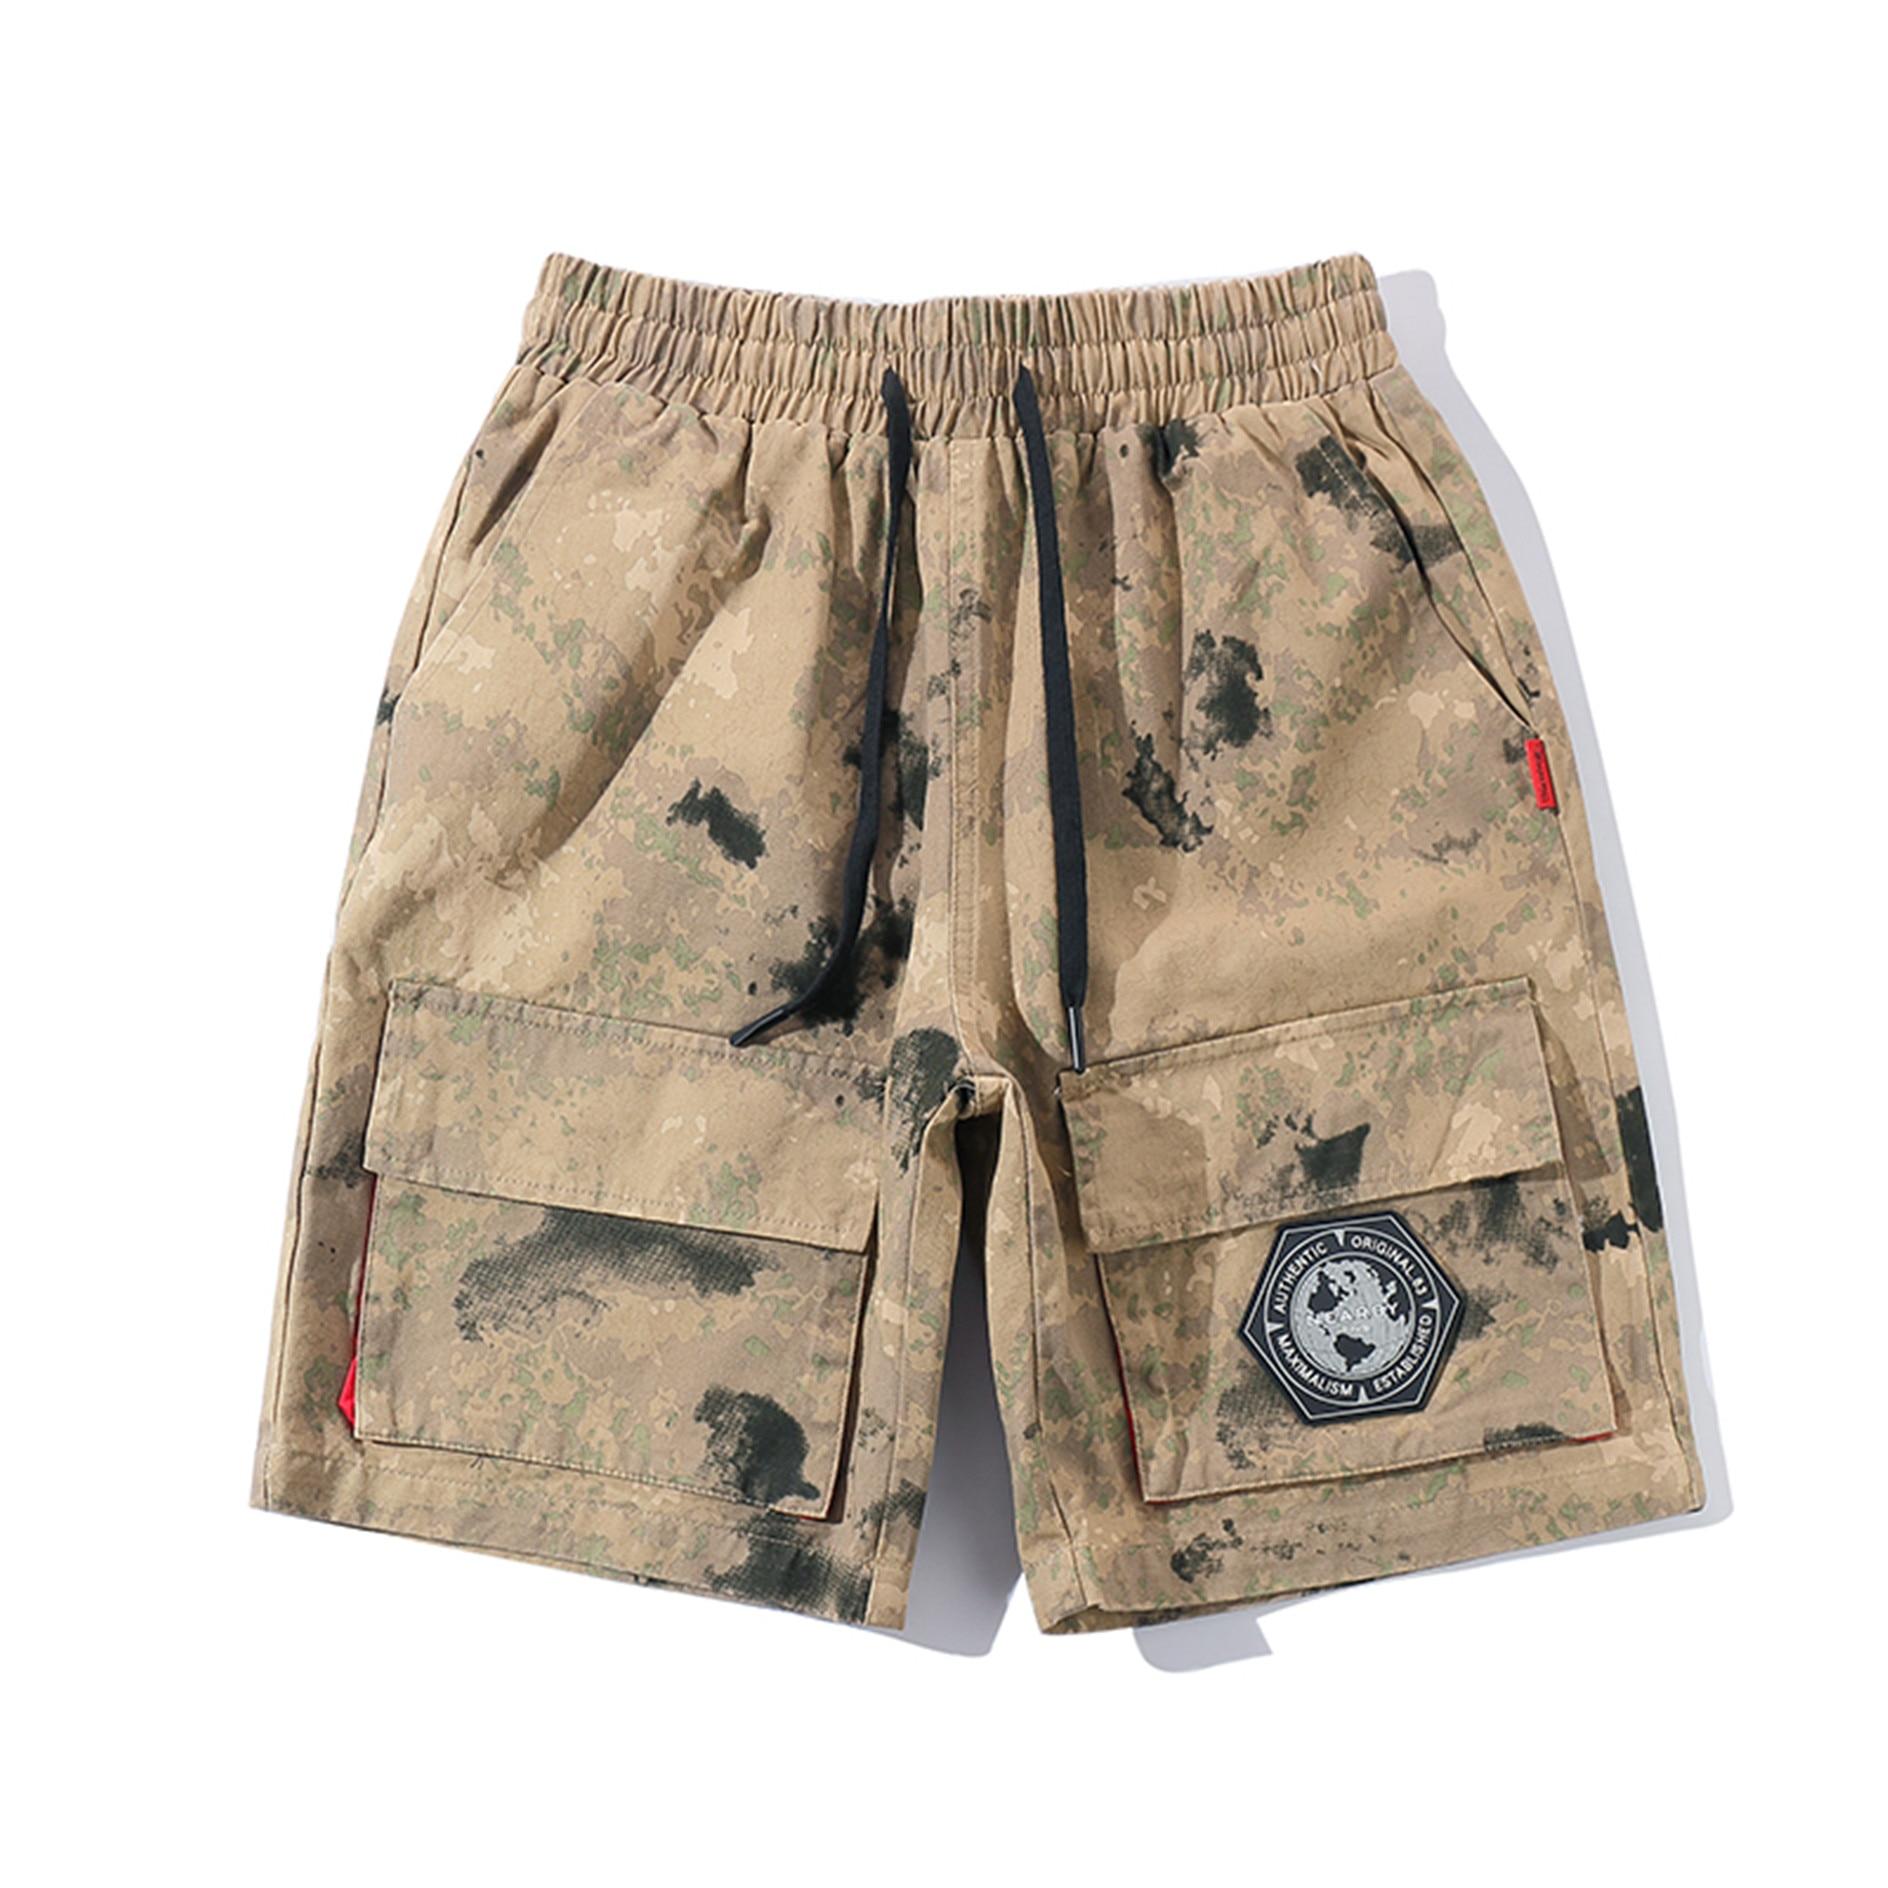 Verano Casual hombres pantalones cortos Vintage pantalones Jogger camuflaje con bolsillos de Kleding vencer Fitness XX60MS